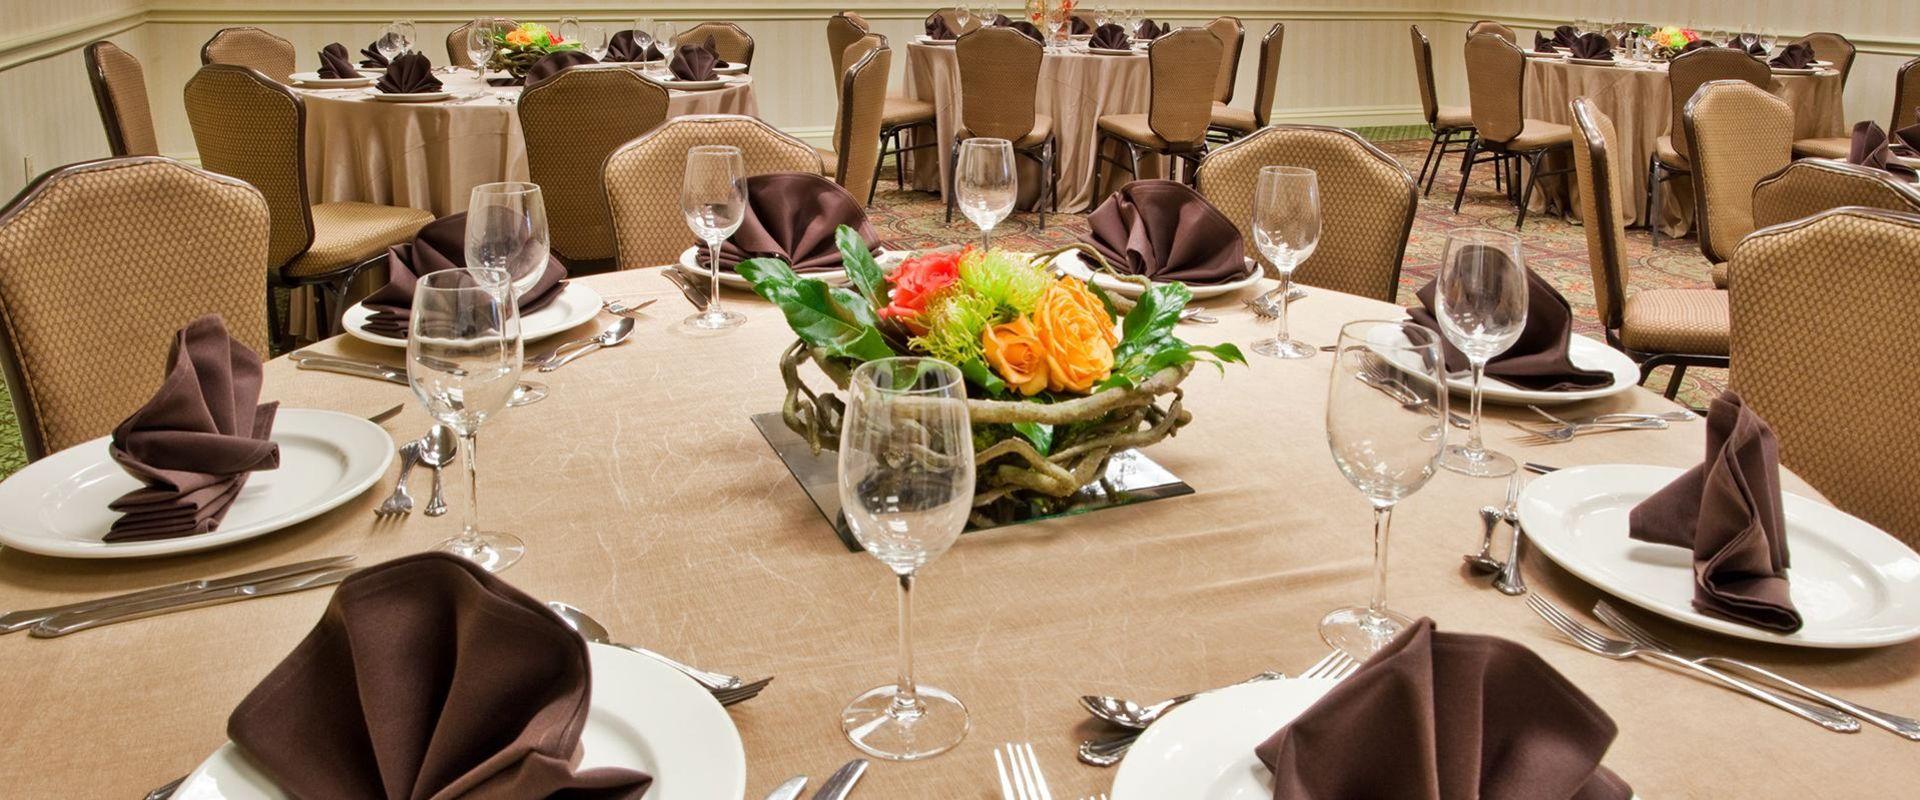 Atlanta Hotel Meeting Venue Table Setting